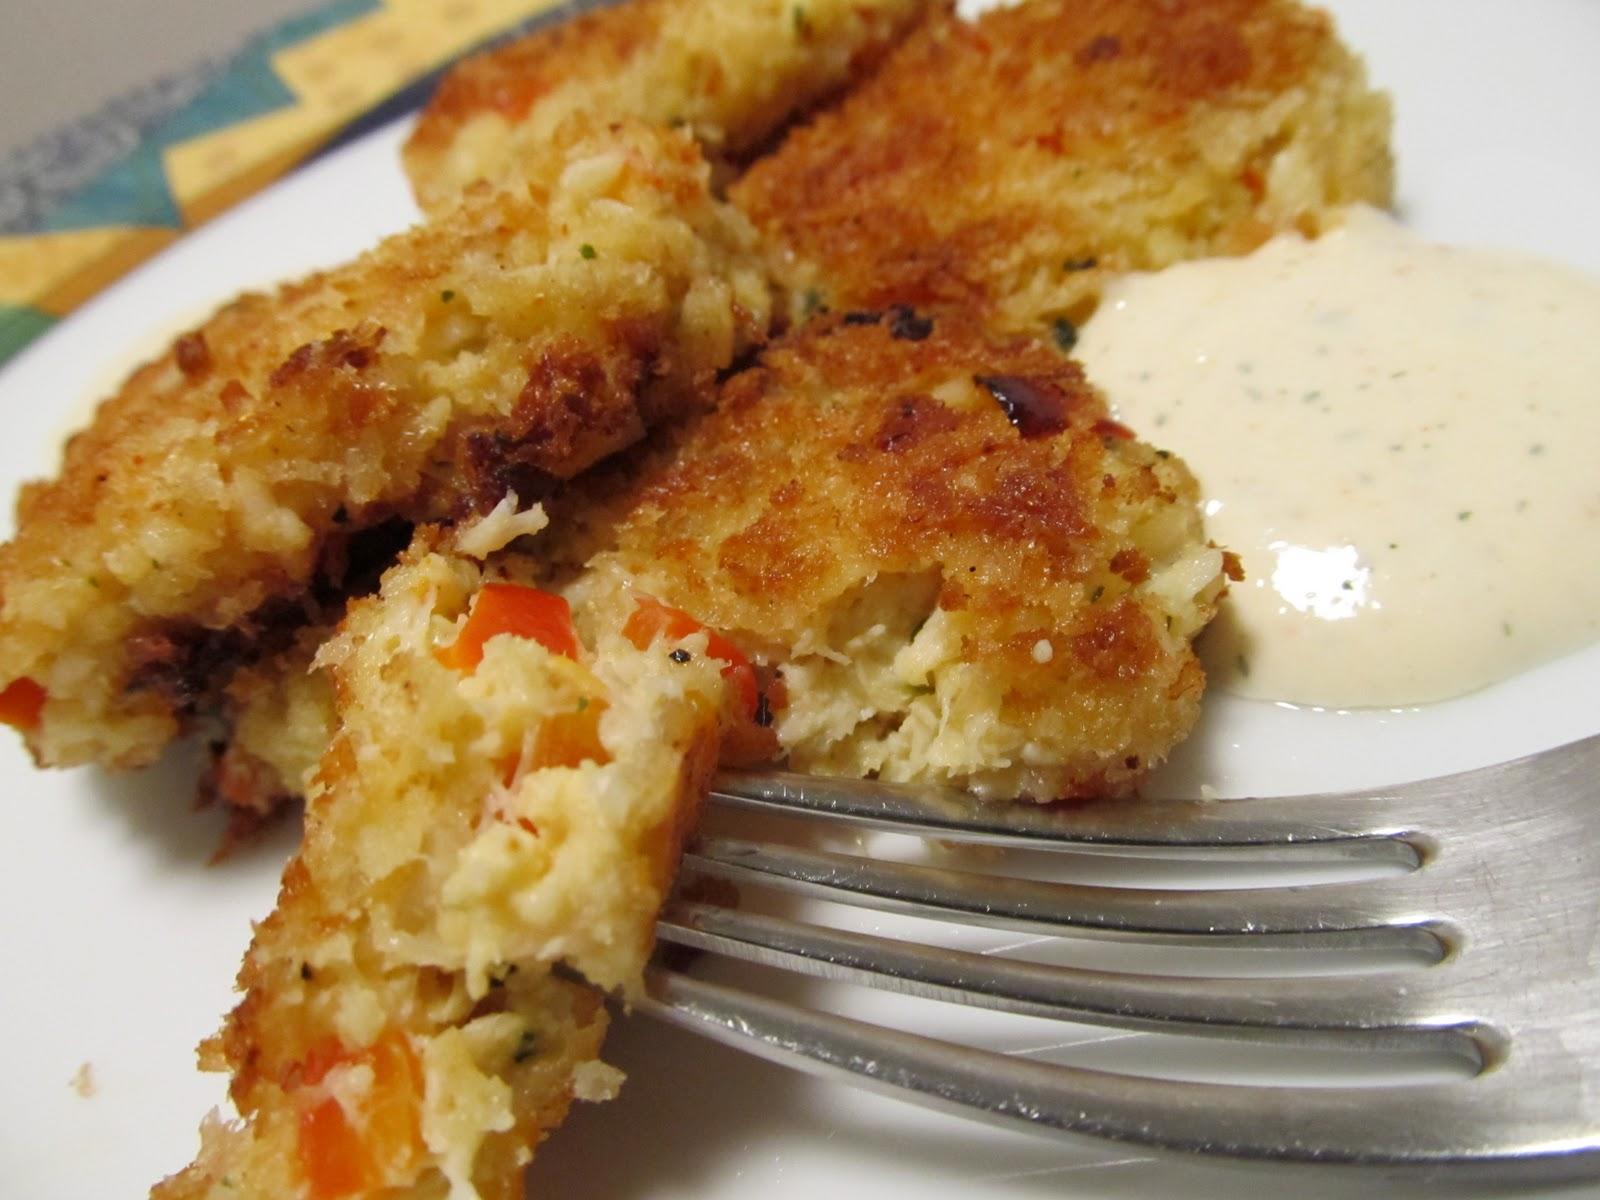 Jenn's Food Journey: Spicy Crab Cakes with Lemon Aioli